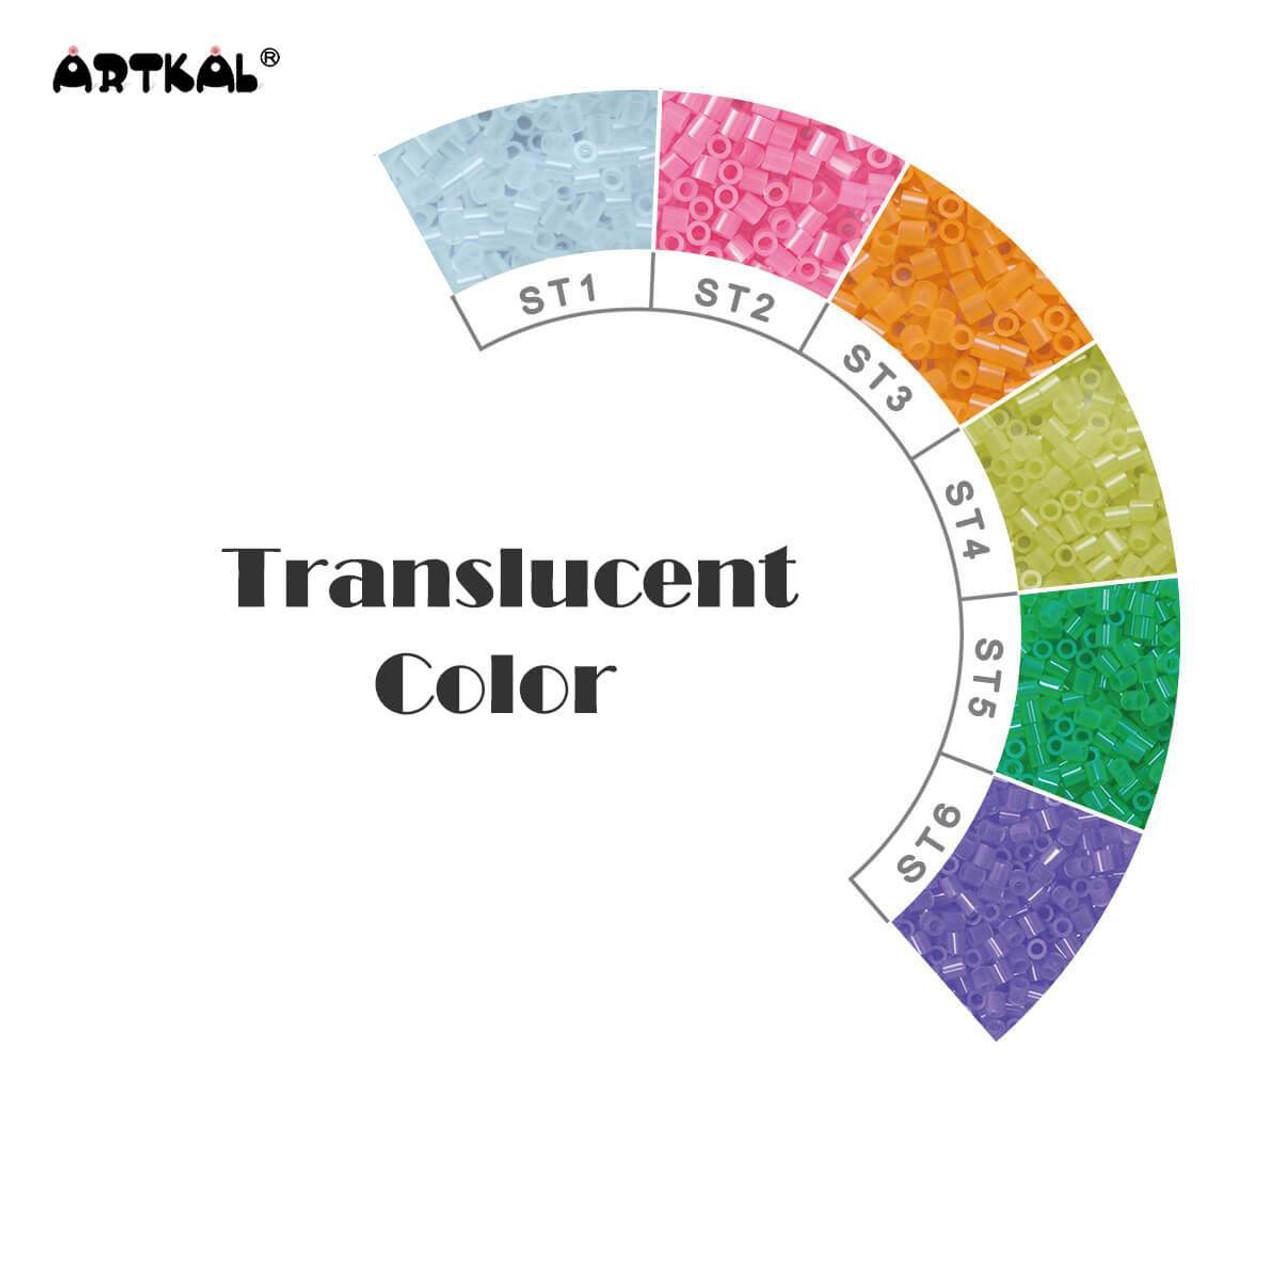 Artkal Translucent